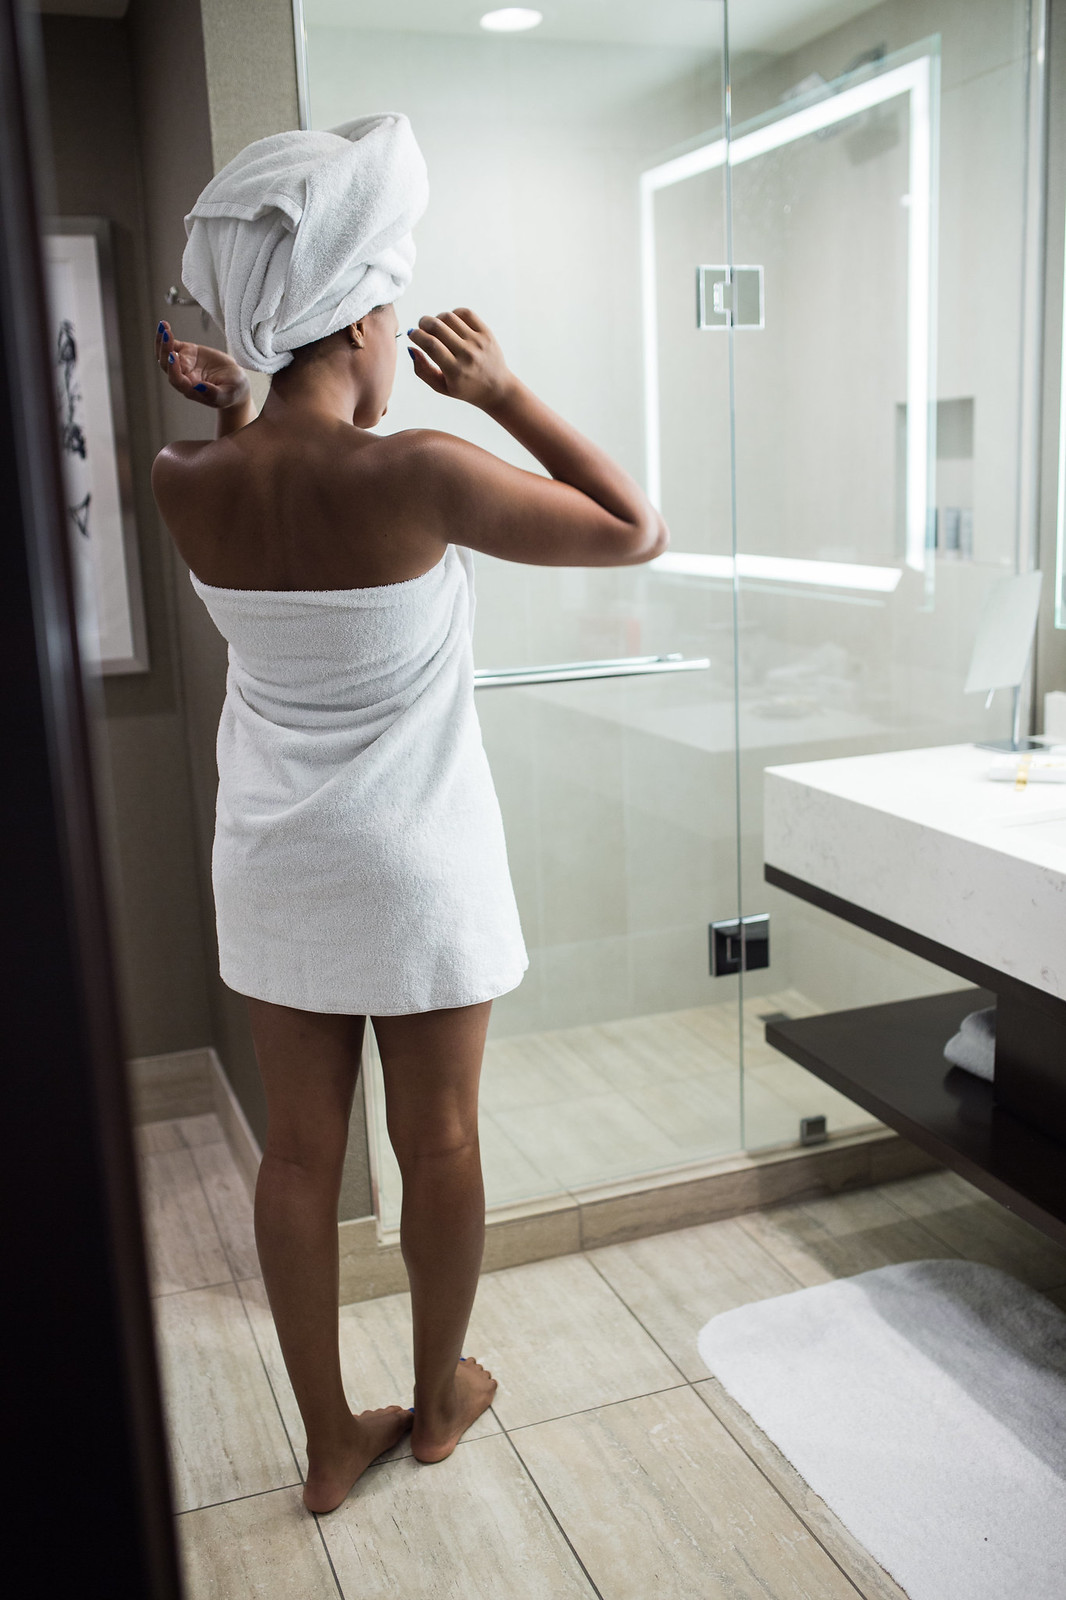 JW Marriott walk in shower